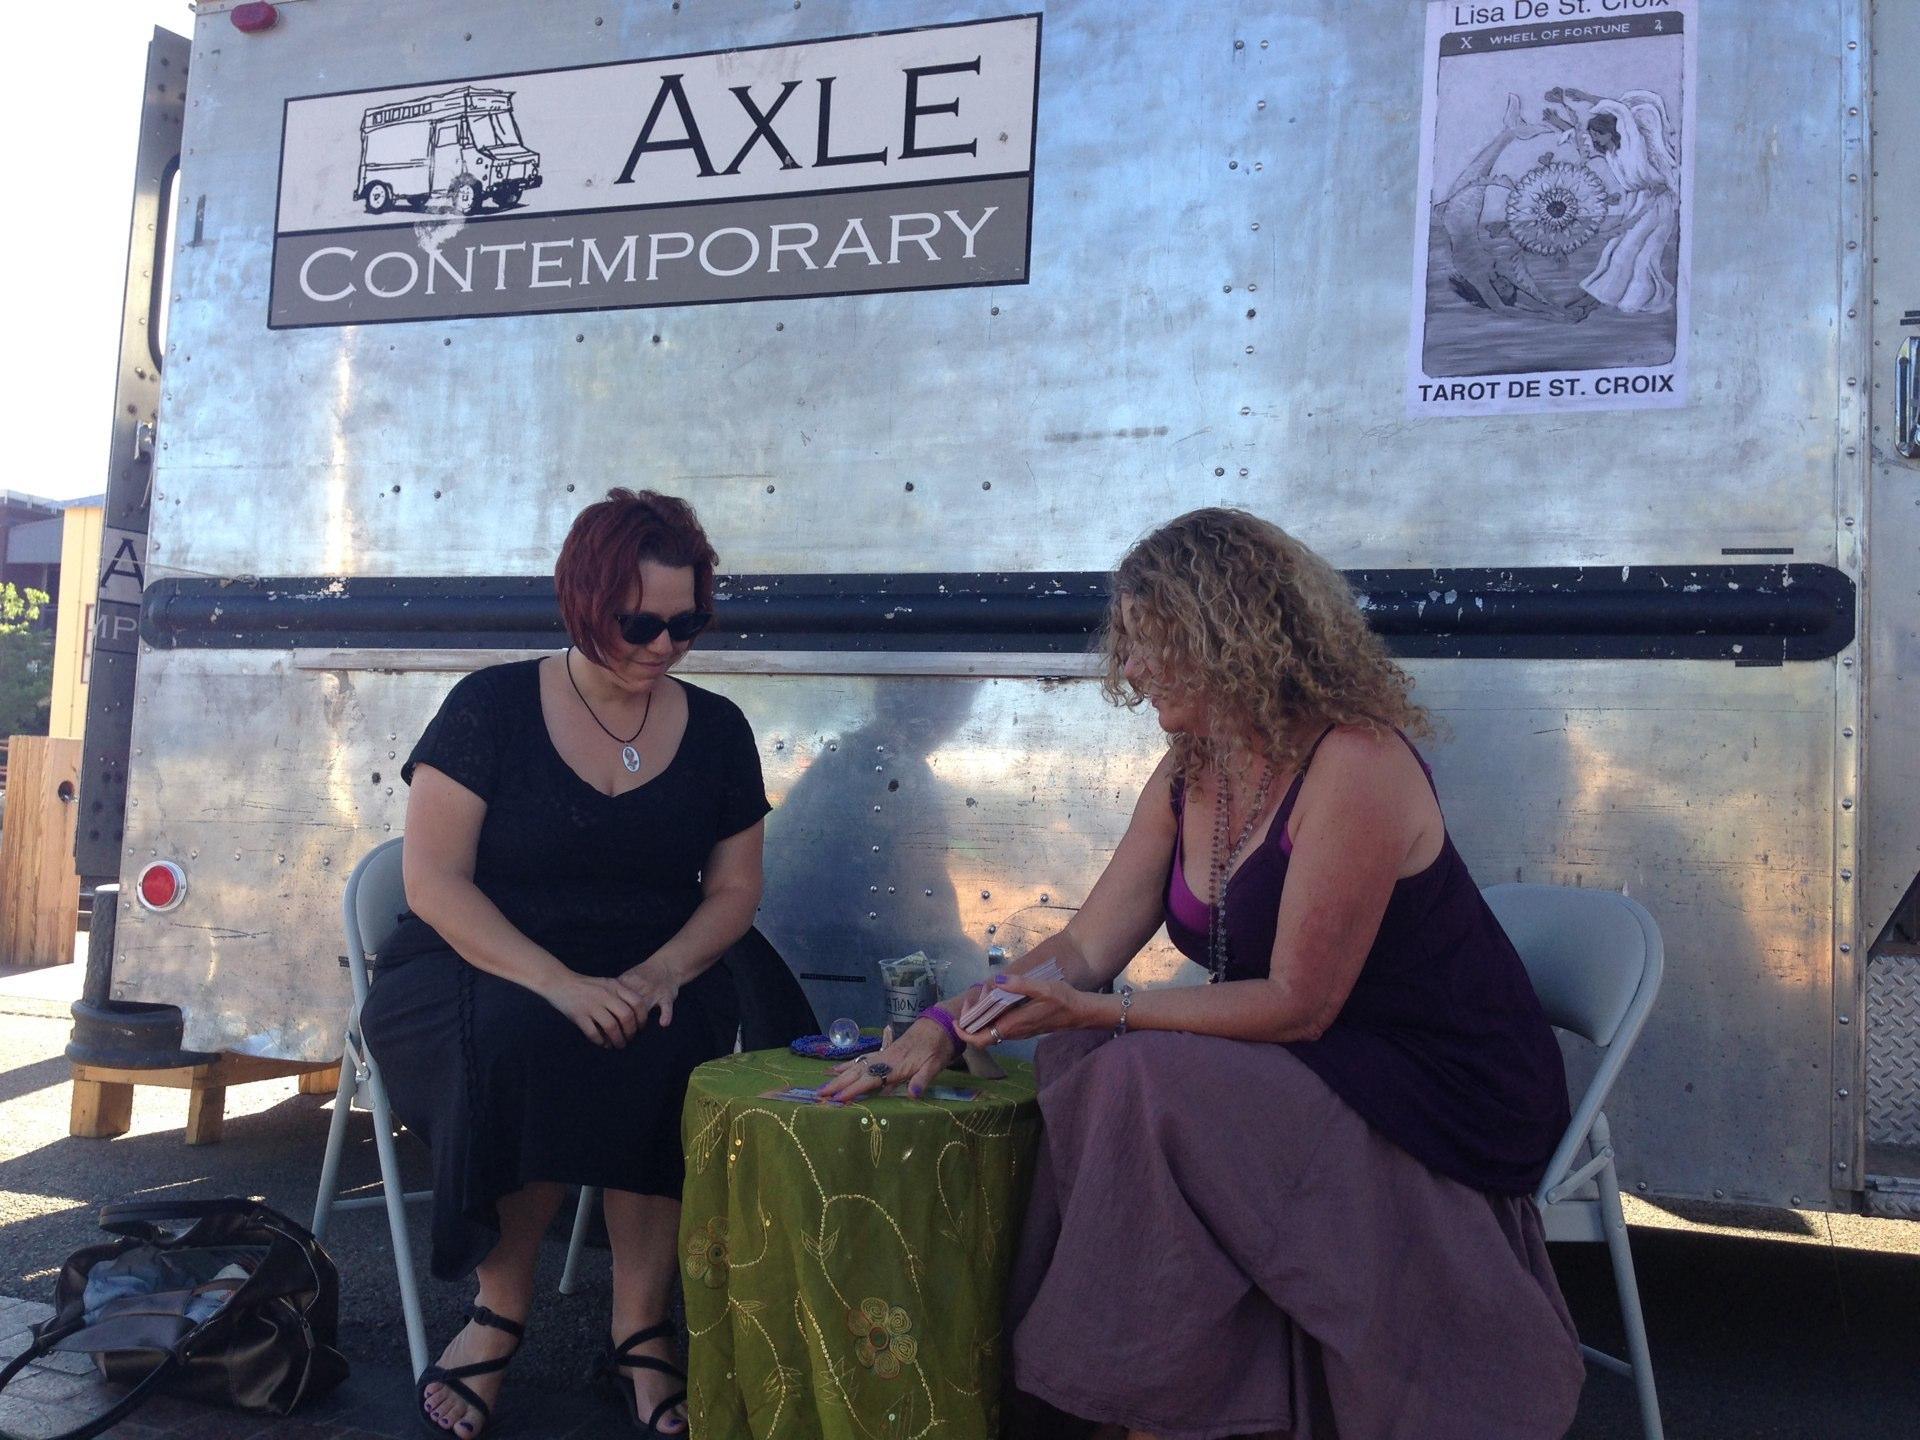 Lisa de St. Croix reading Tarot